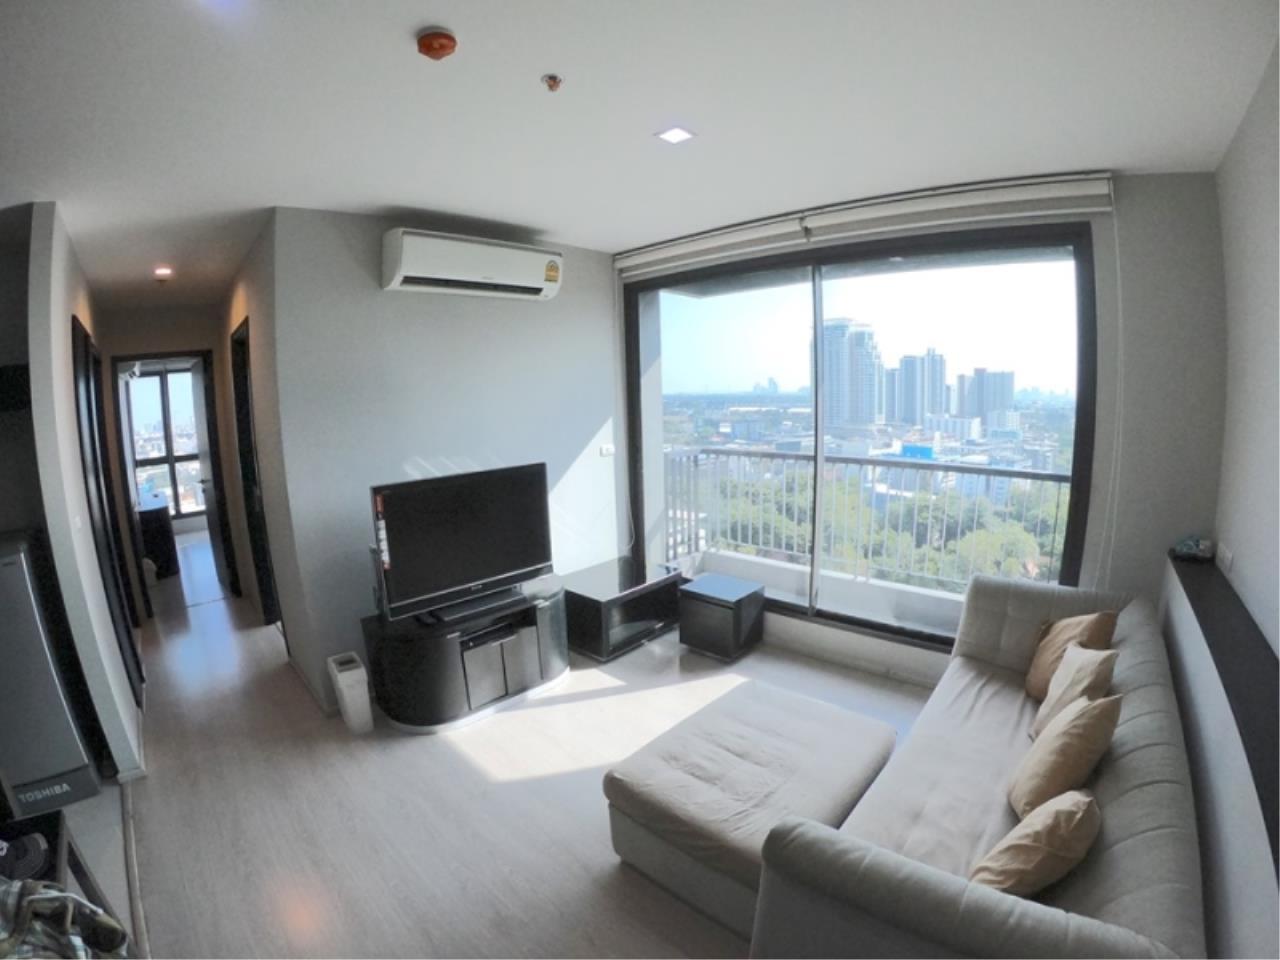 Century21 Skylux Agency's Rhythm Sukhumvit 44/1 / Condo For Sale / 2 Bedroom / 52.2 SQM / BTS Phra Khanong / Bangkok 4